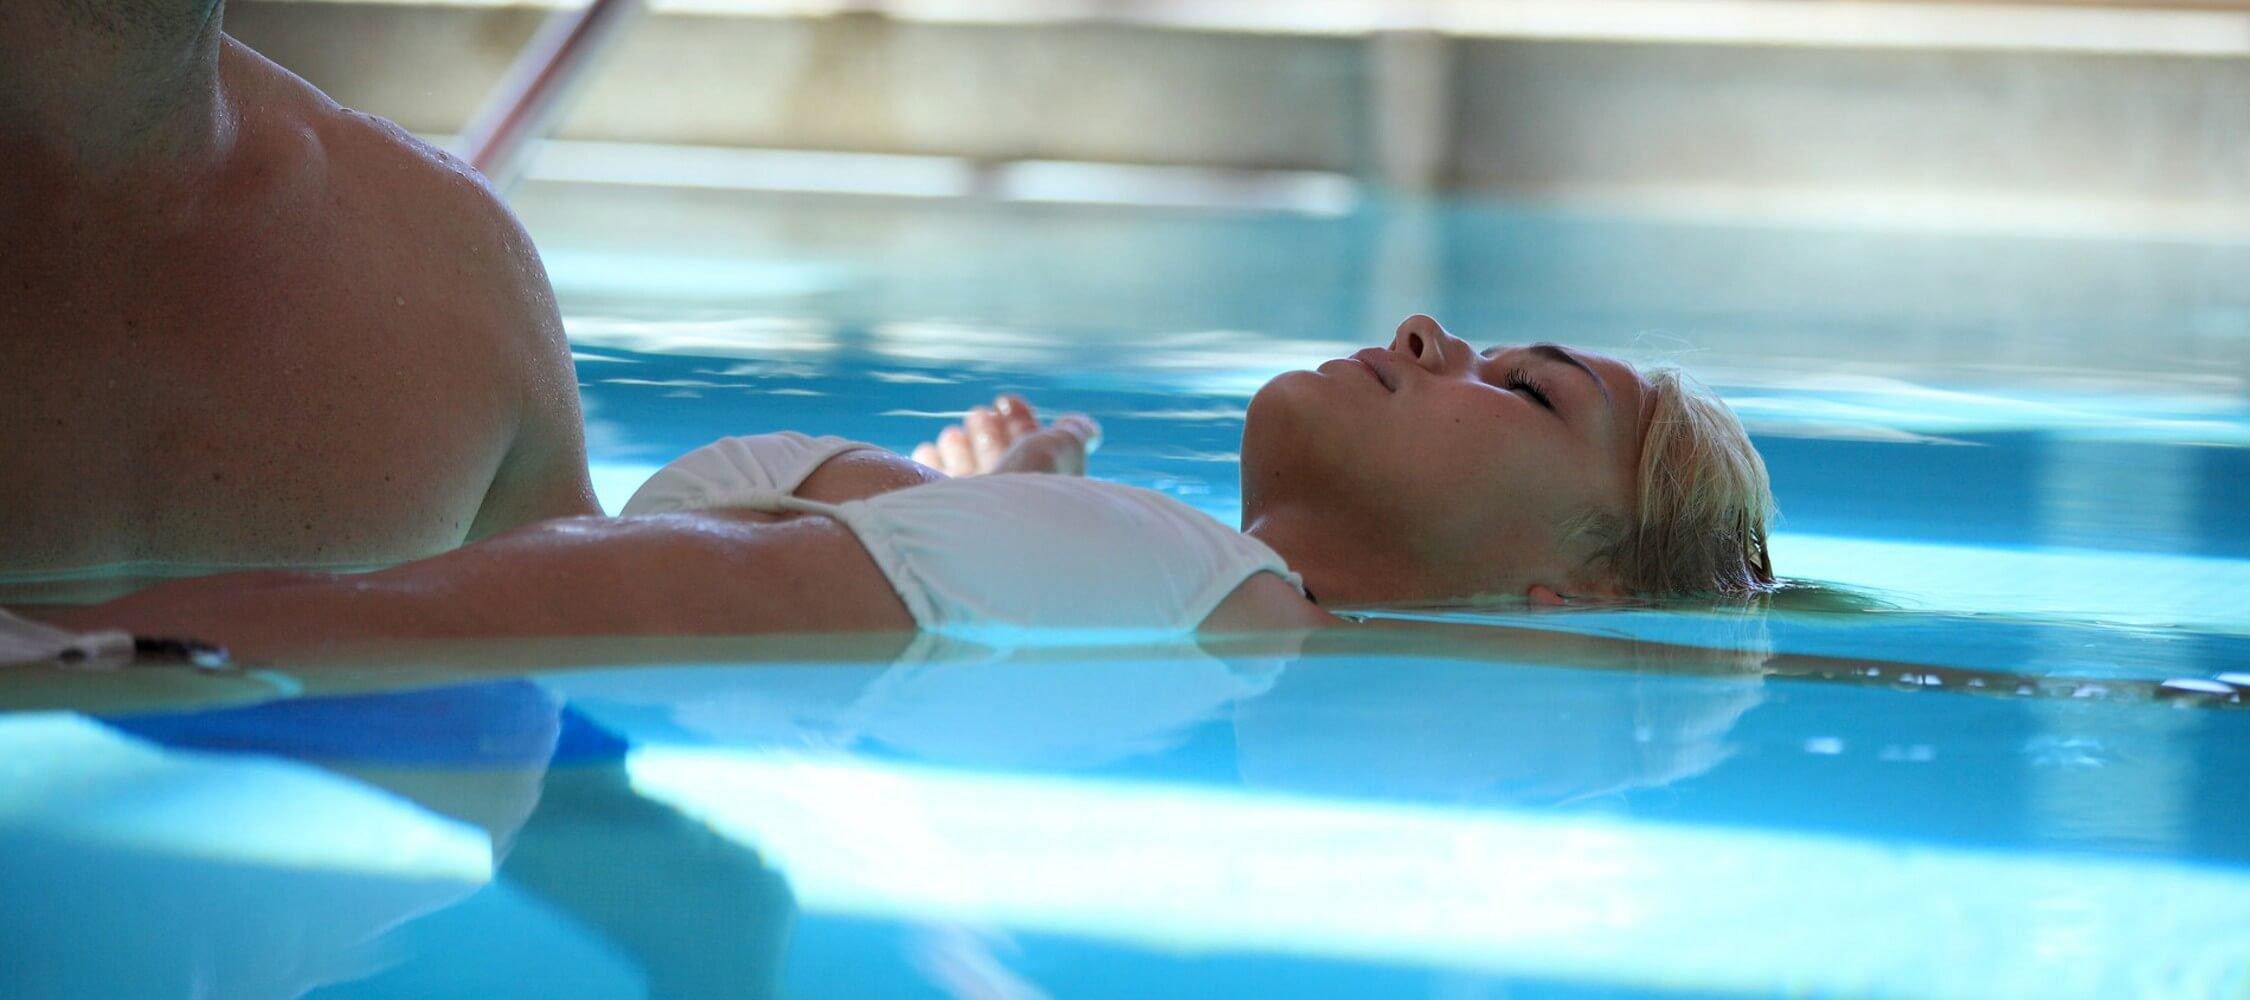 Italien-Trentino_Suedtirol_Alto_Adige_Merano_Meran_Therme_Pool_Badehalle_Schwimmbad_Frau_Manuela_Prossliner_2250x1000